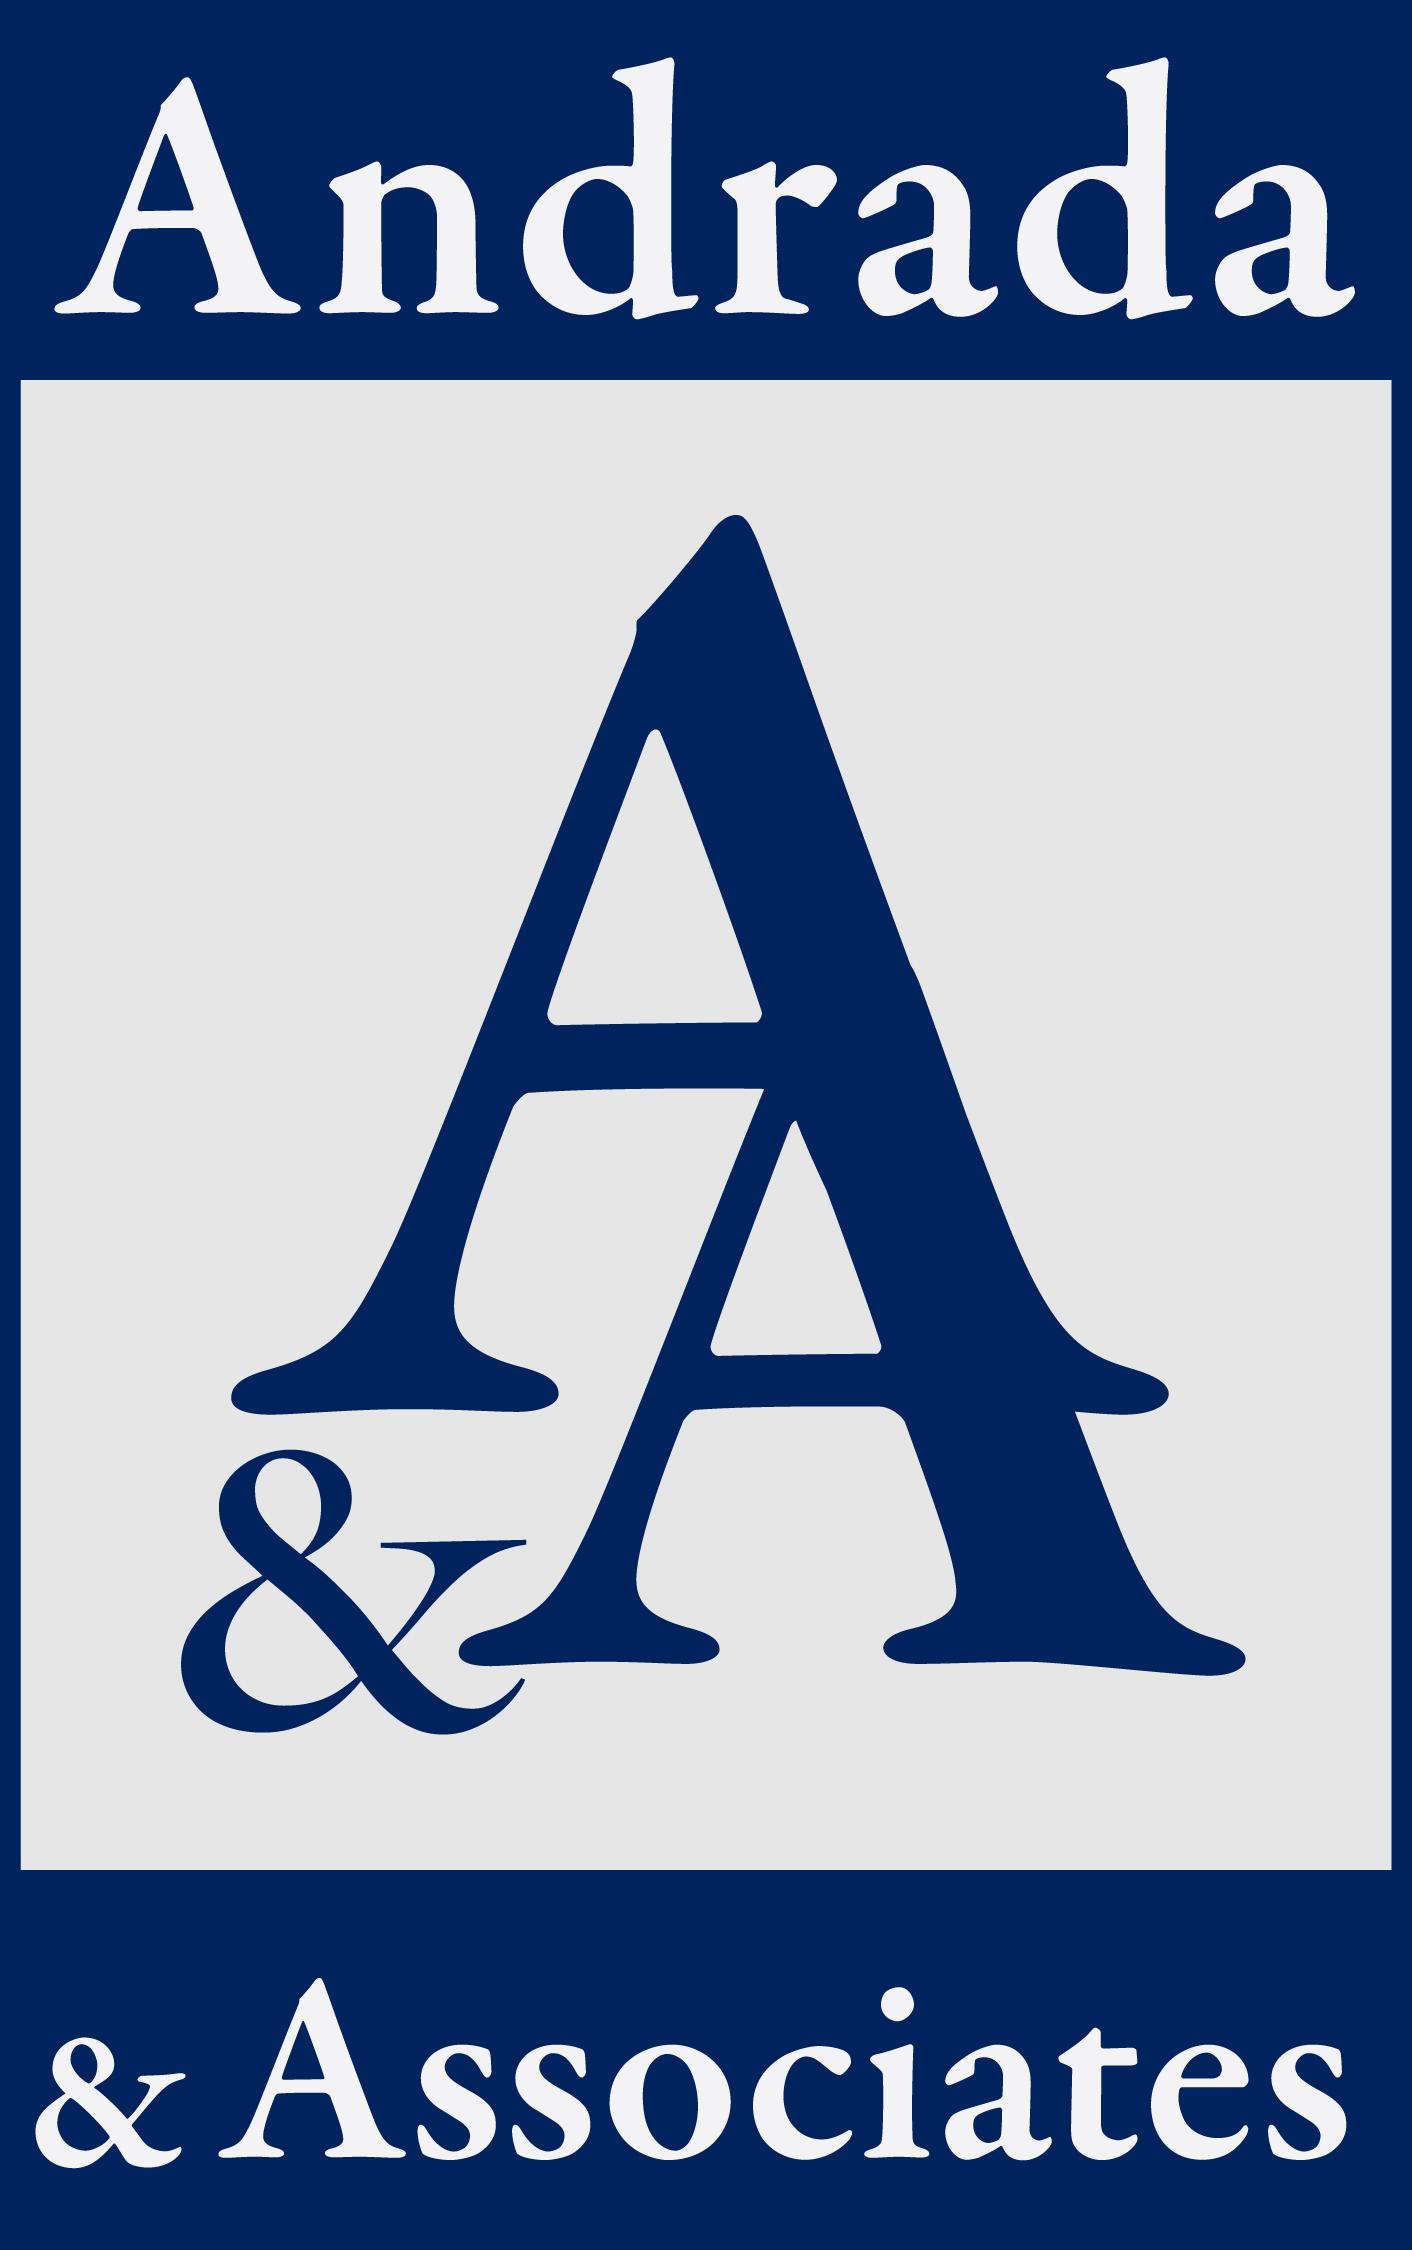 Andrada and Associates